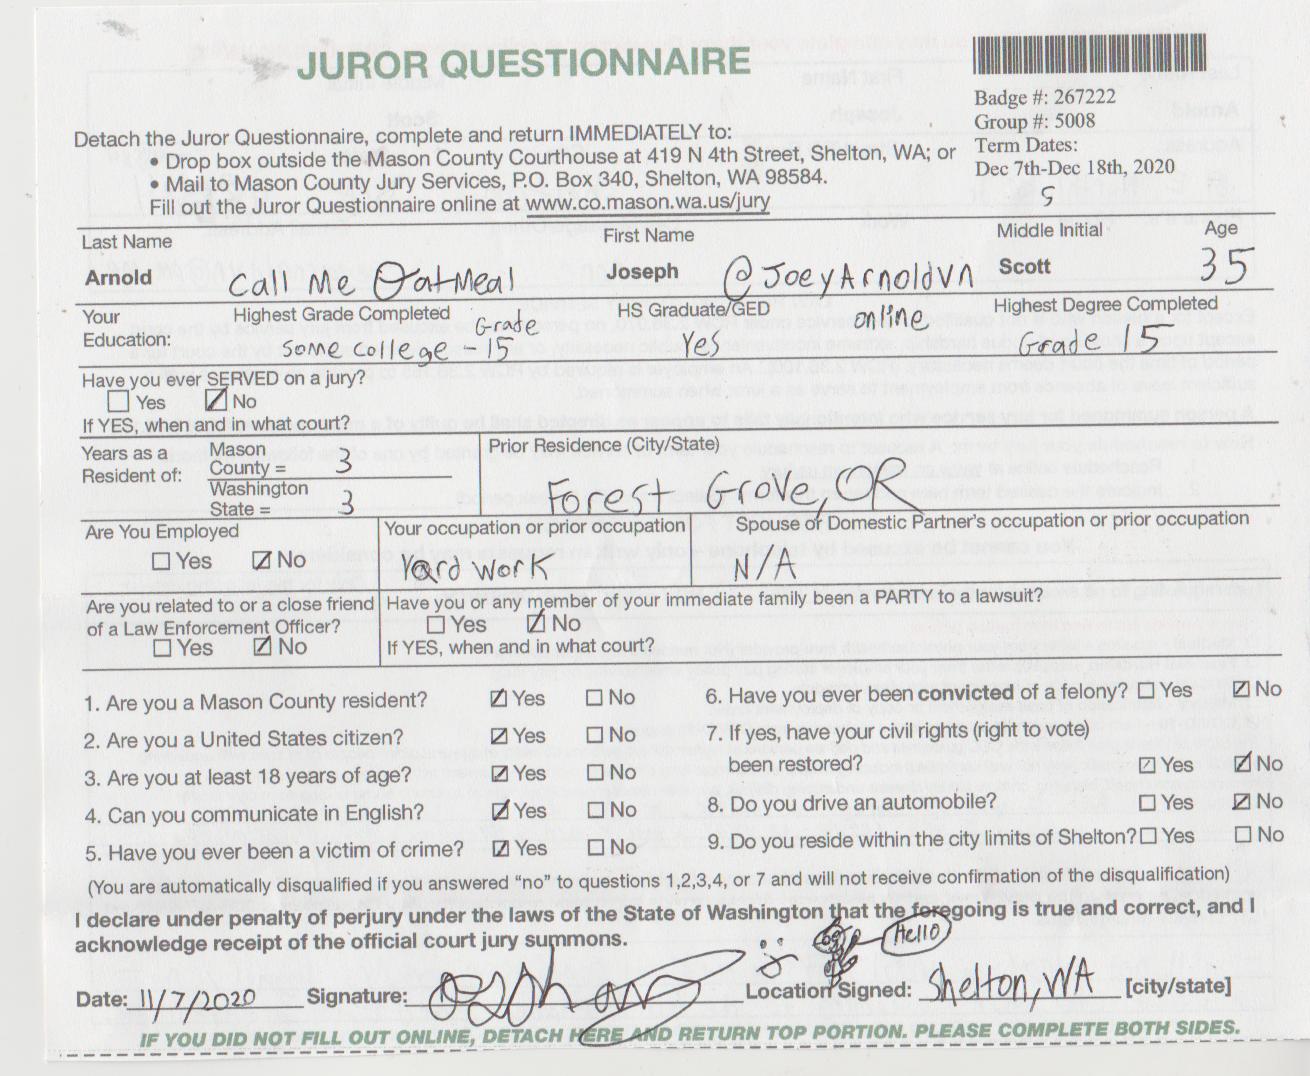 2020-11-07 - Saturday - 03:00 PM LMS JA - Jury Duty Request - Shelton WA - Form & Survey Pages Update-1.png